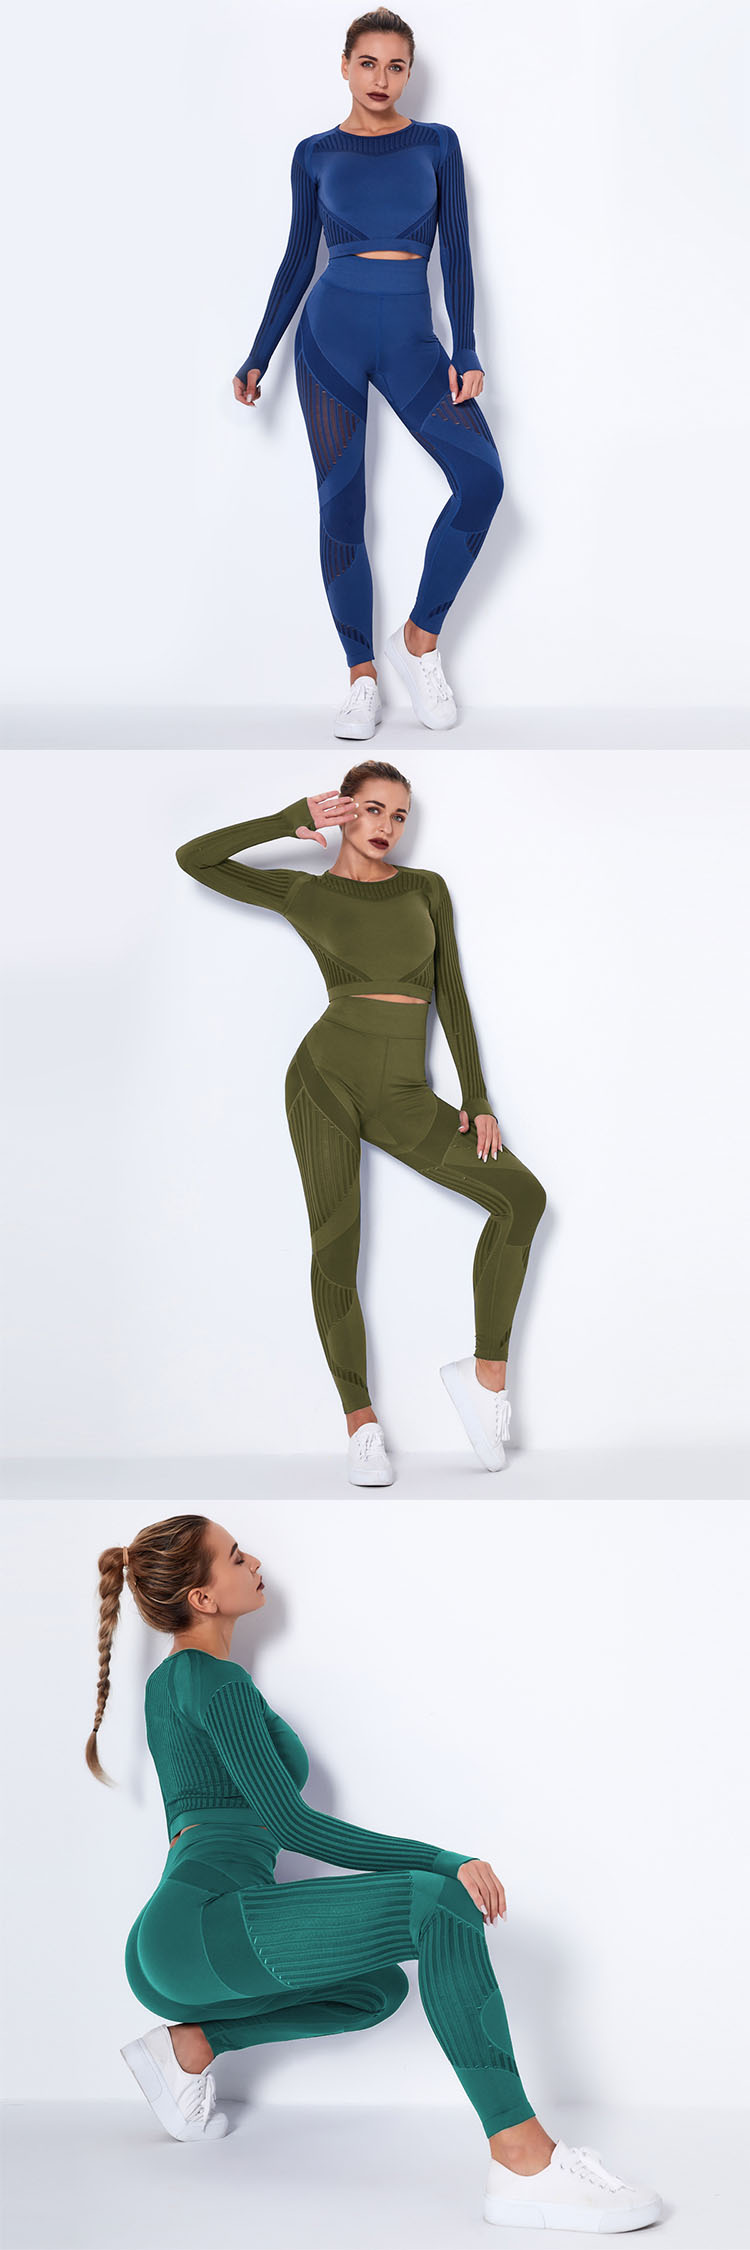 Slim slimming, light and comfortable, versatile and fashionable.